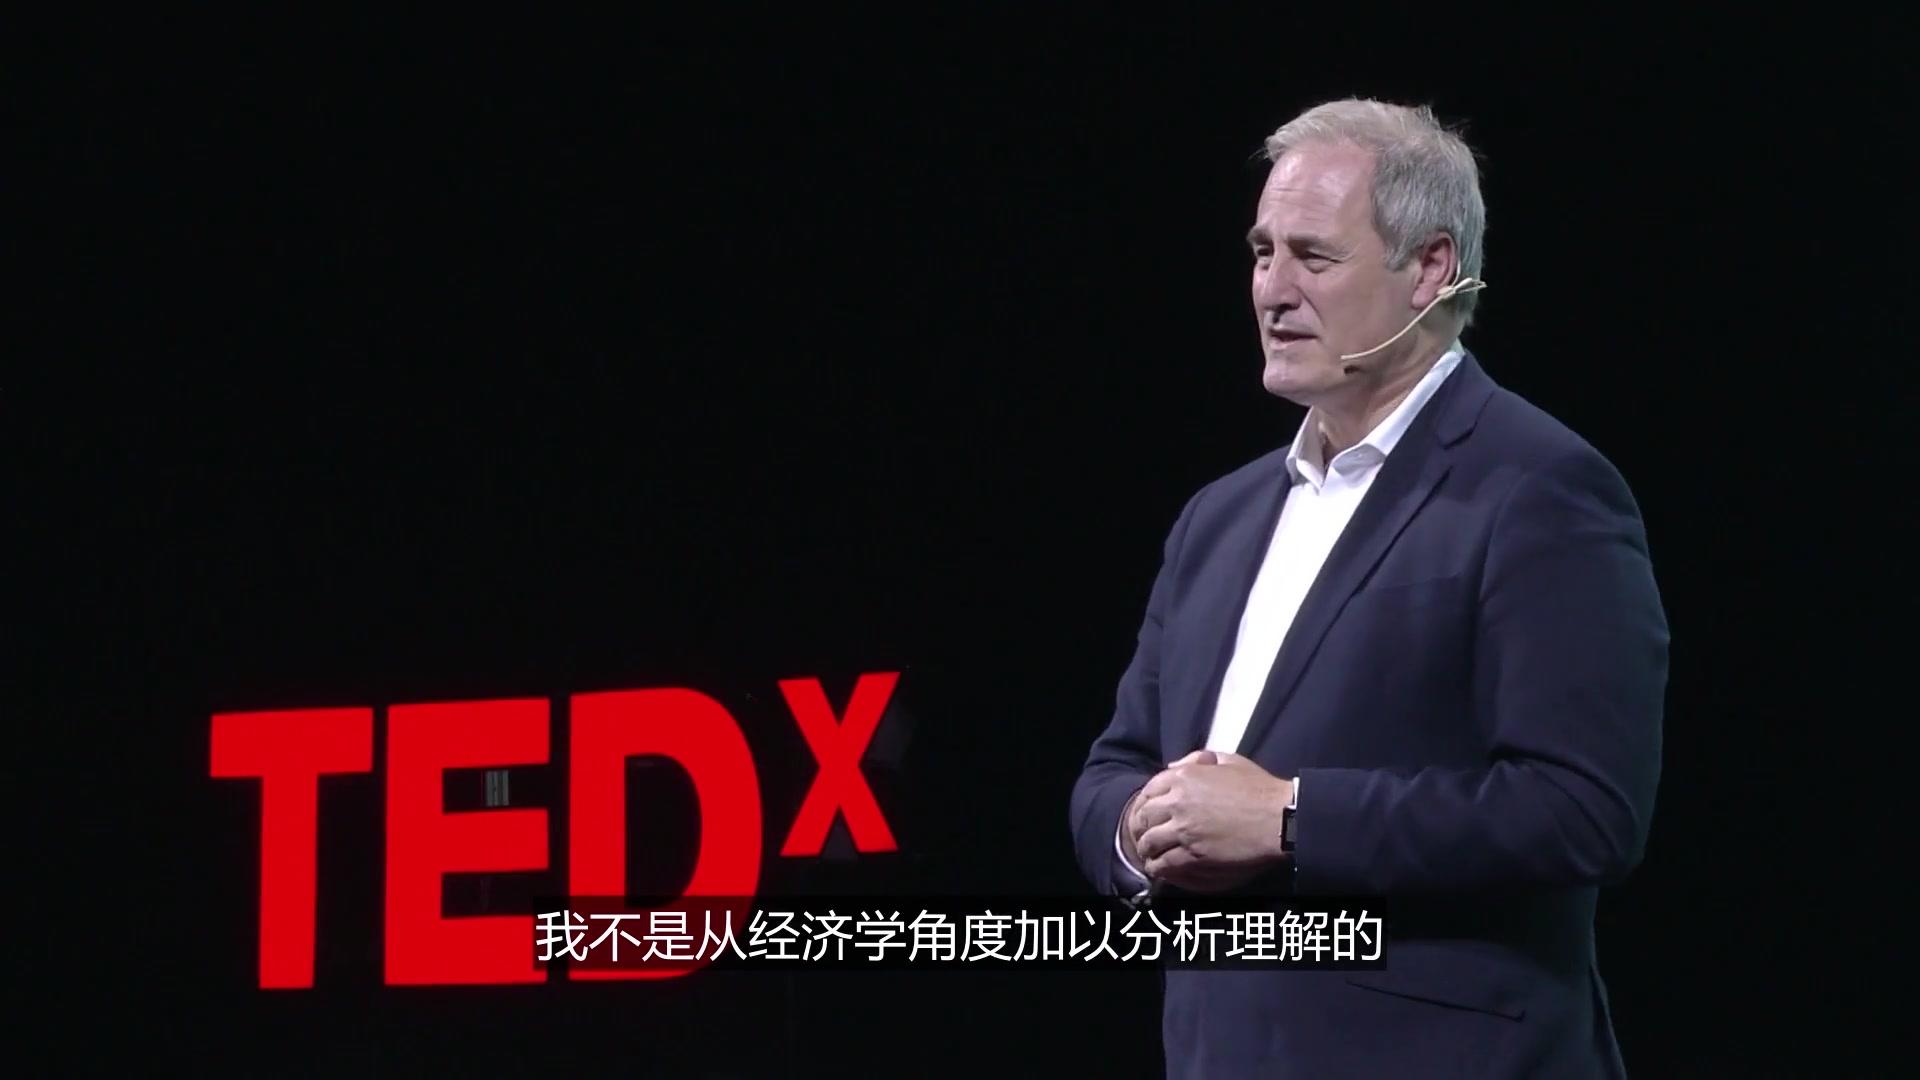 社会资讯_【TED演讲】麦克·贝茨:我难忘的一次中国行_哔哩哔哩 (゜-゜)つ ...